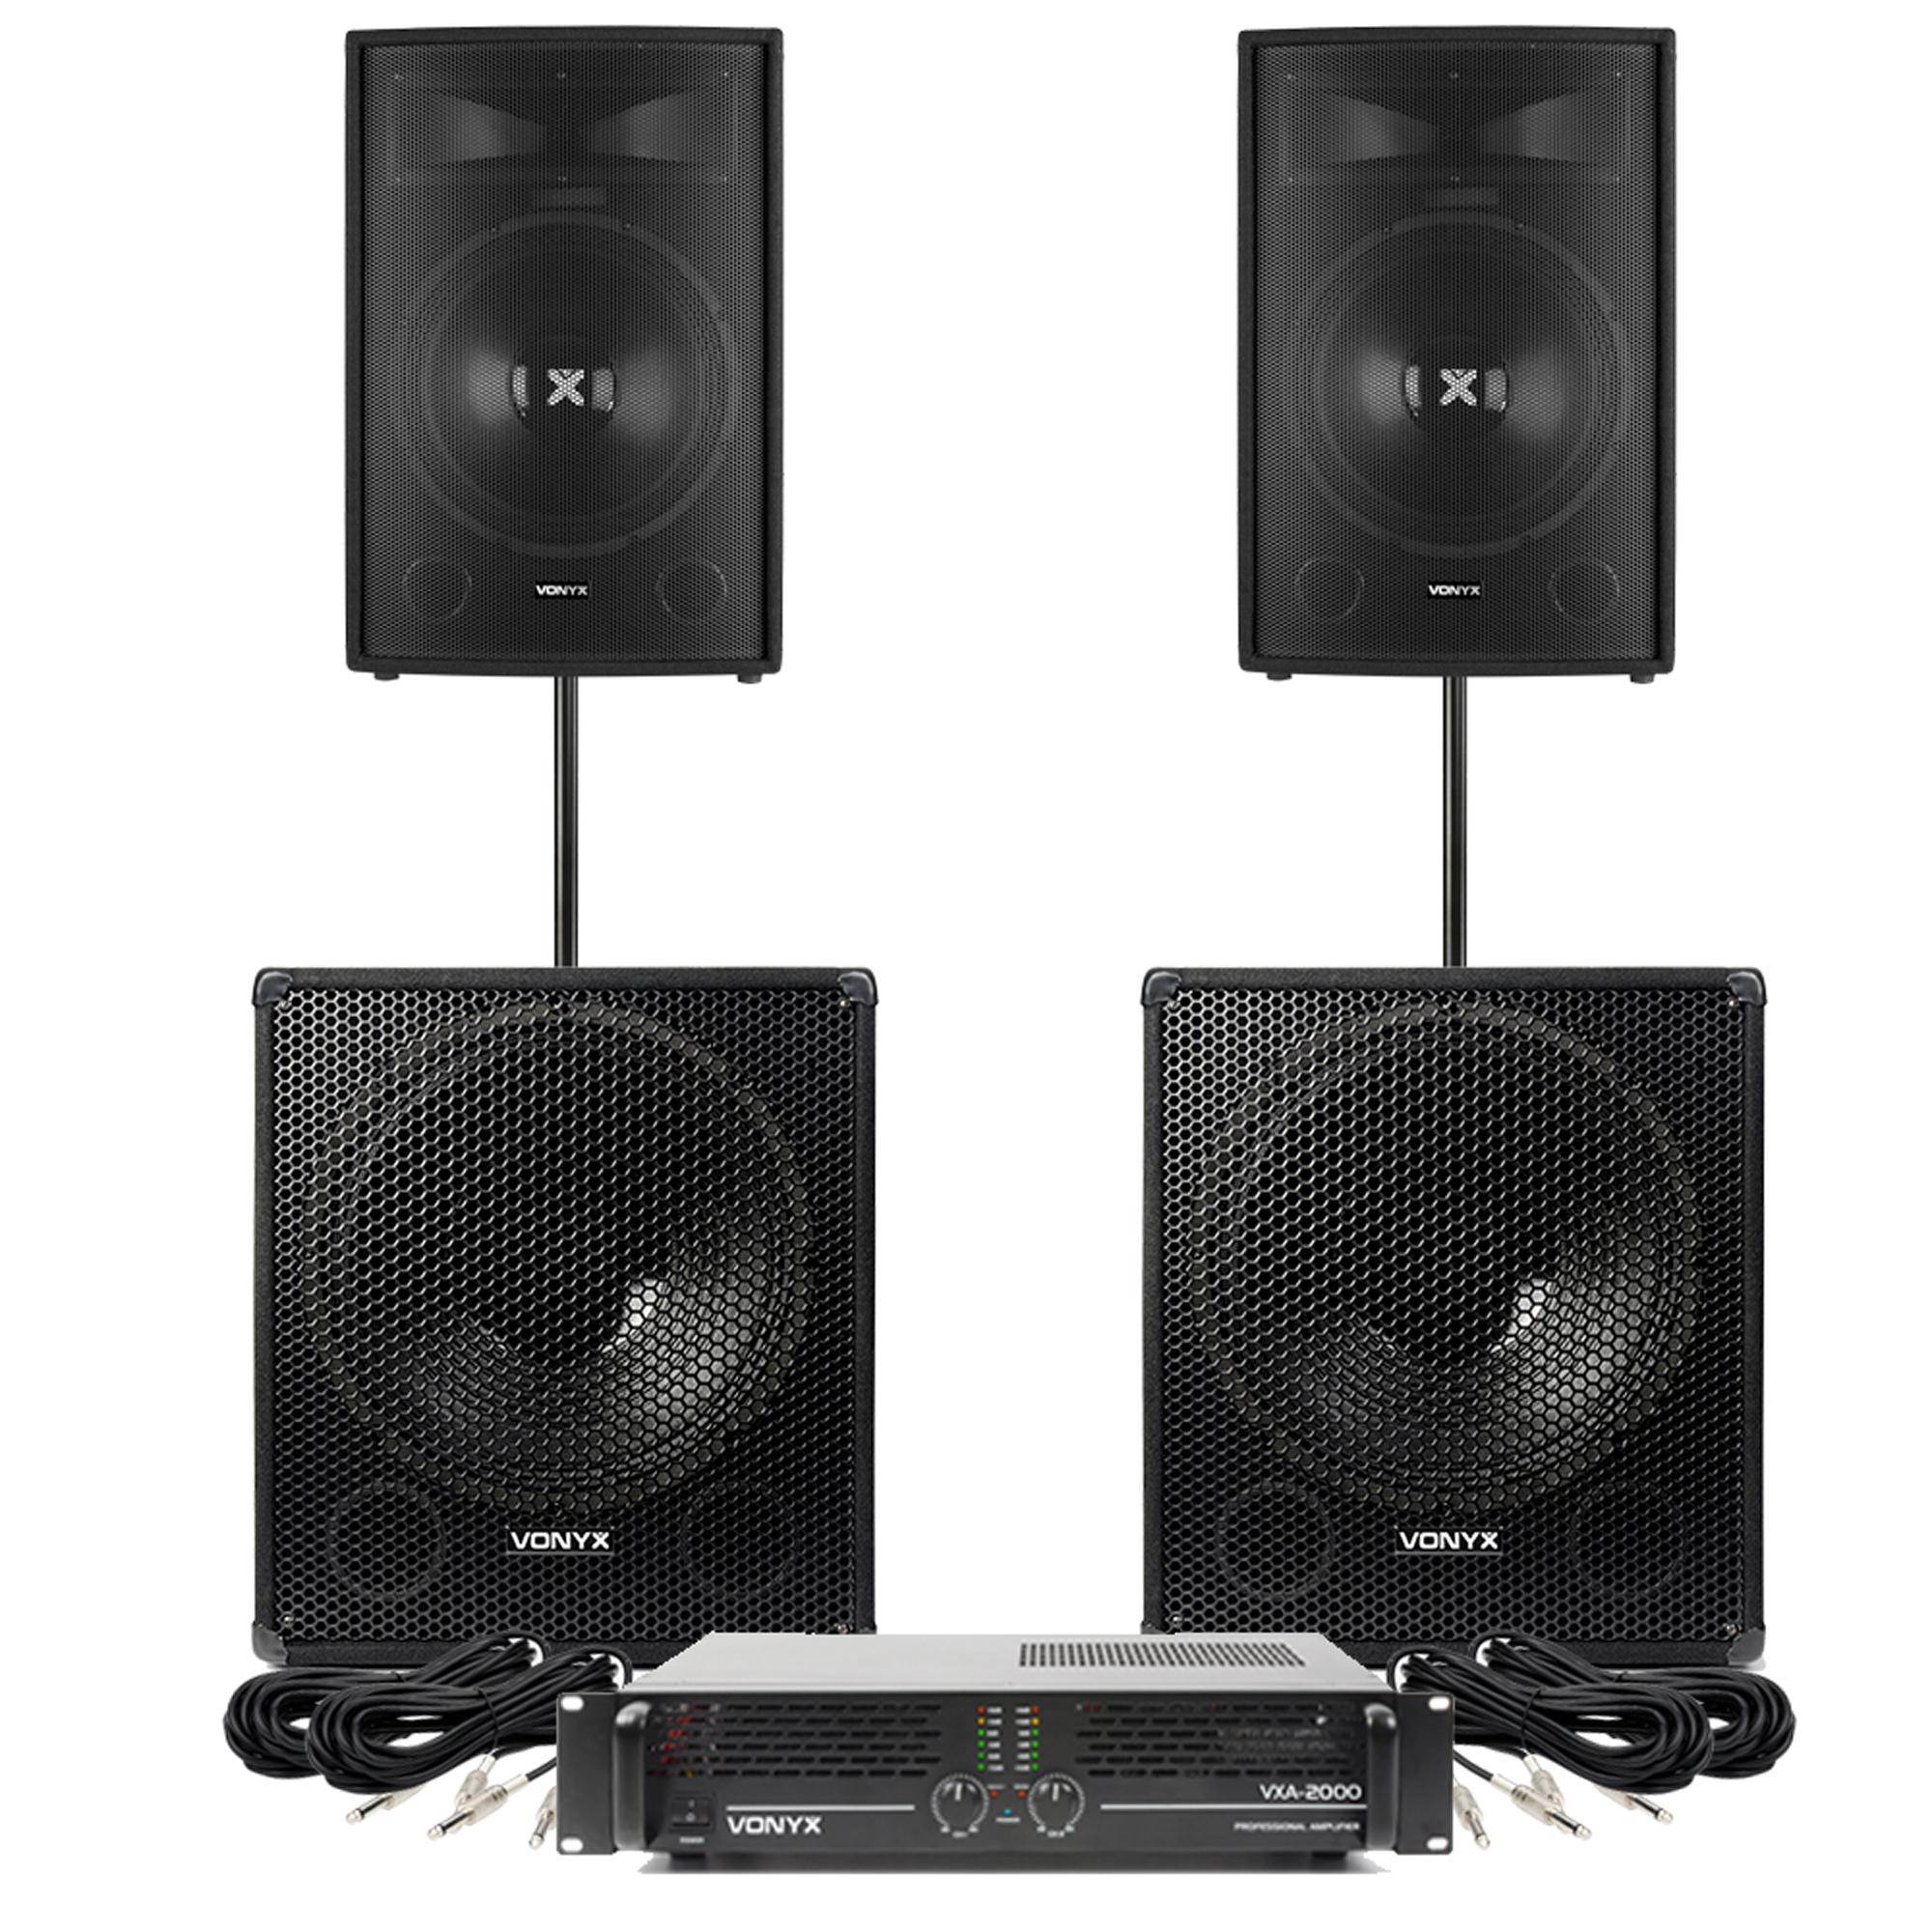 "Vonyx SL15 15"" Passive DJ Speaker Pair with 18"" Subwoofers & VXA-2000 Amplifier"